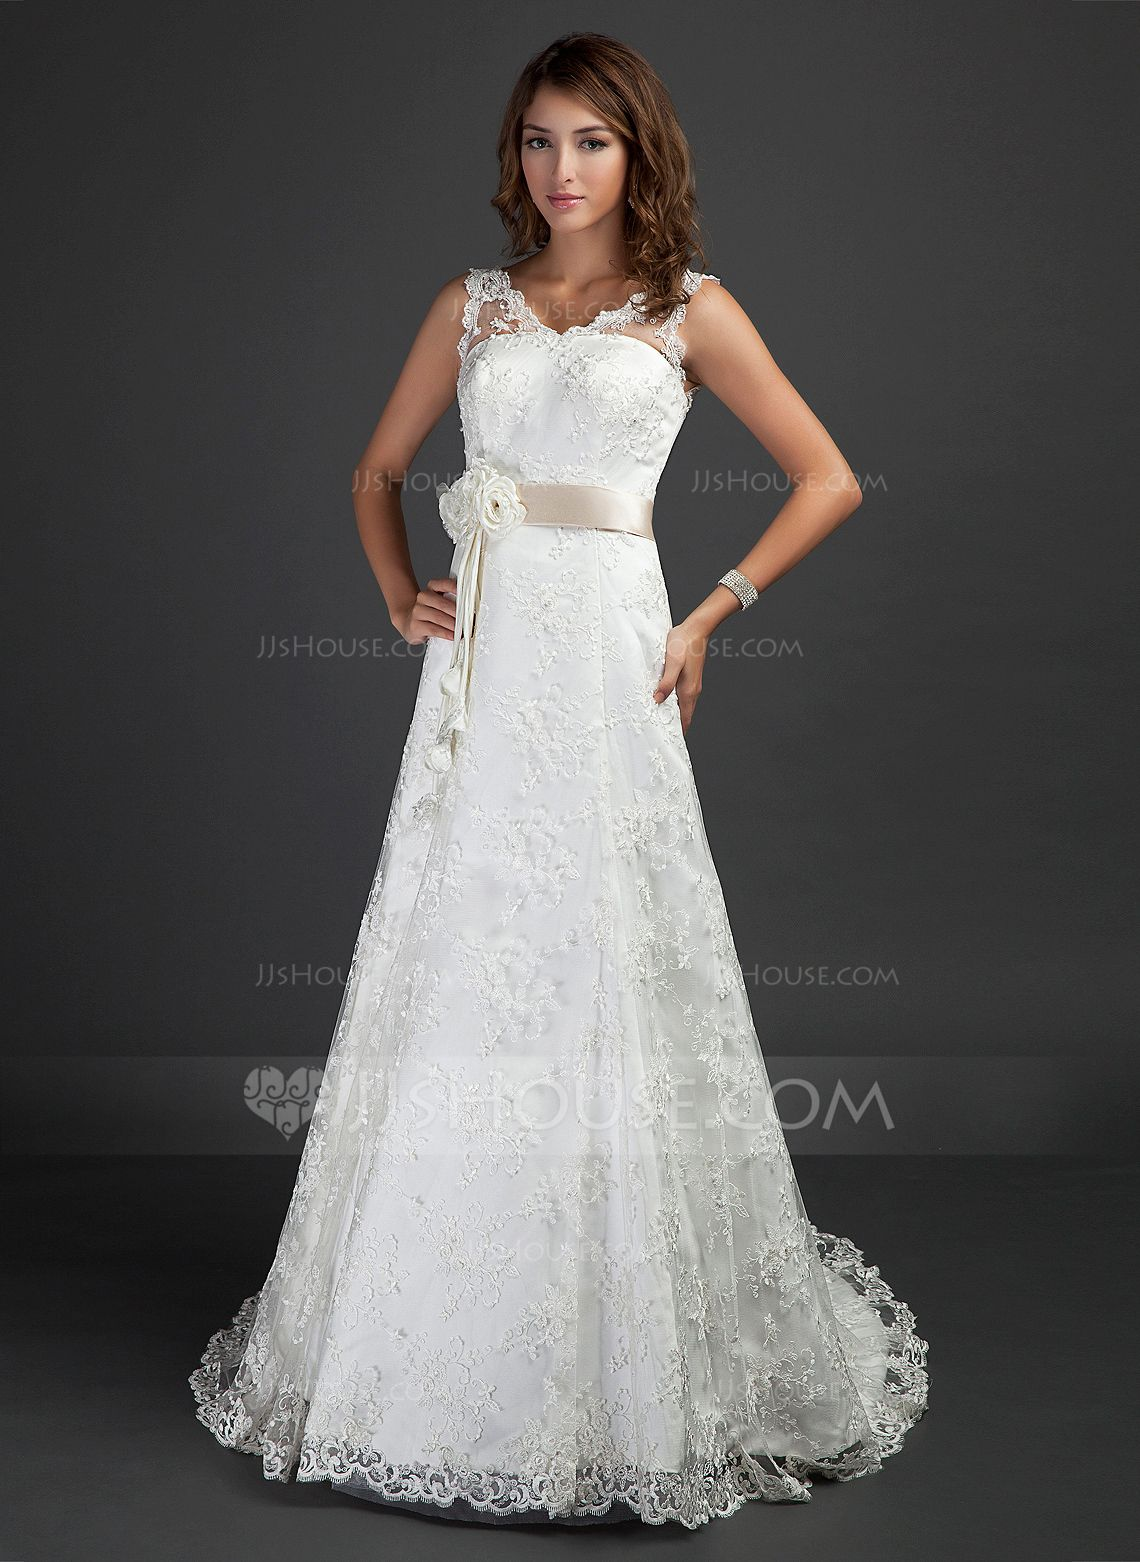 Alineprincess vneck court train lace wedding dress with sash